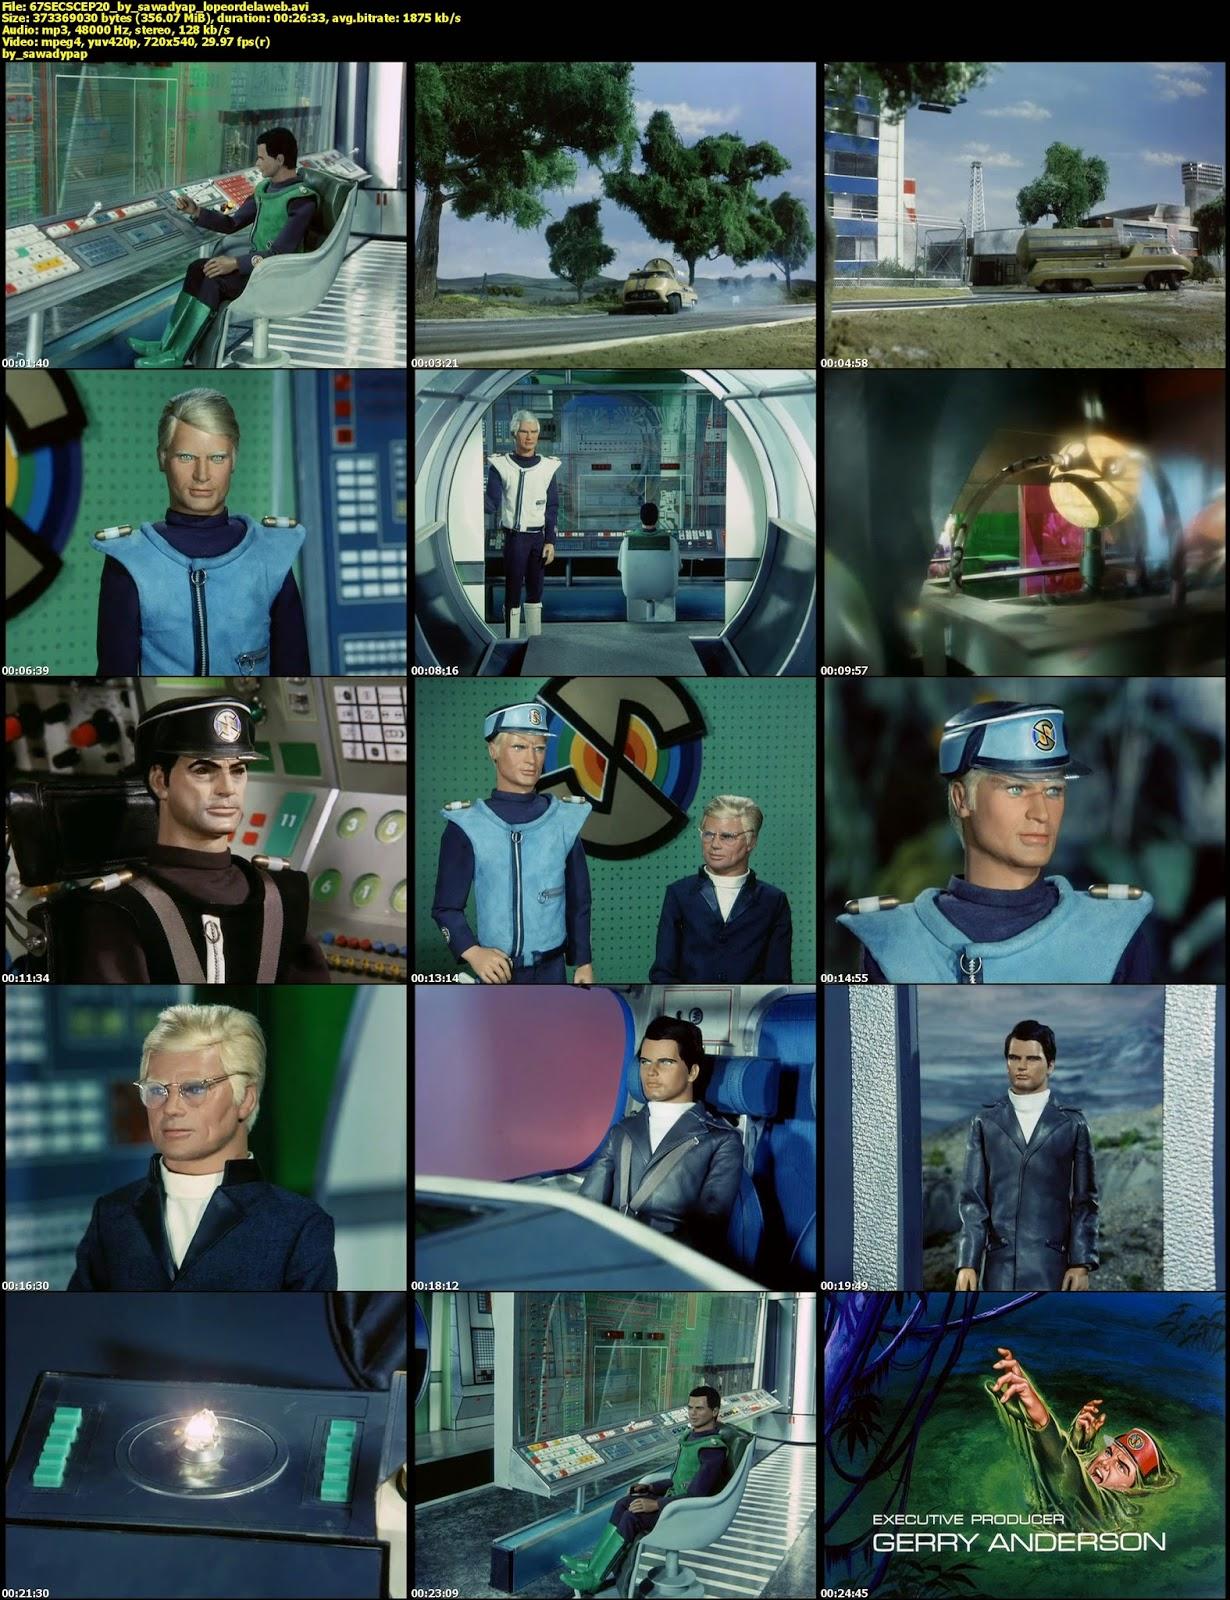 [Serie] El Capitán Escarlata [1967] [DVDRip] [Subtitulada]